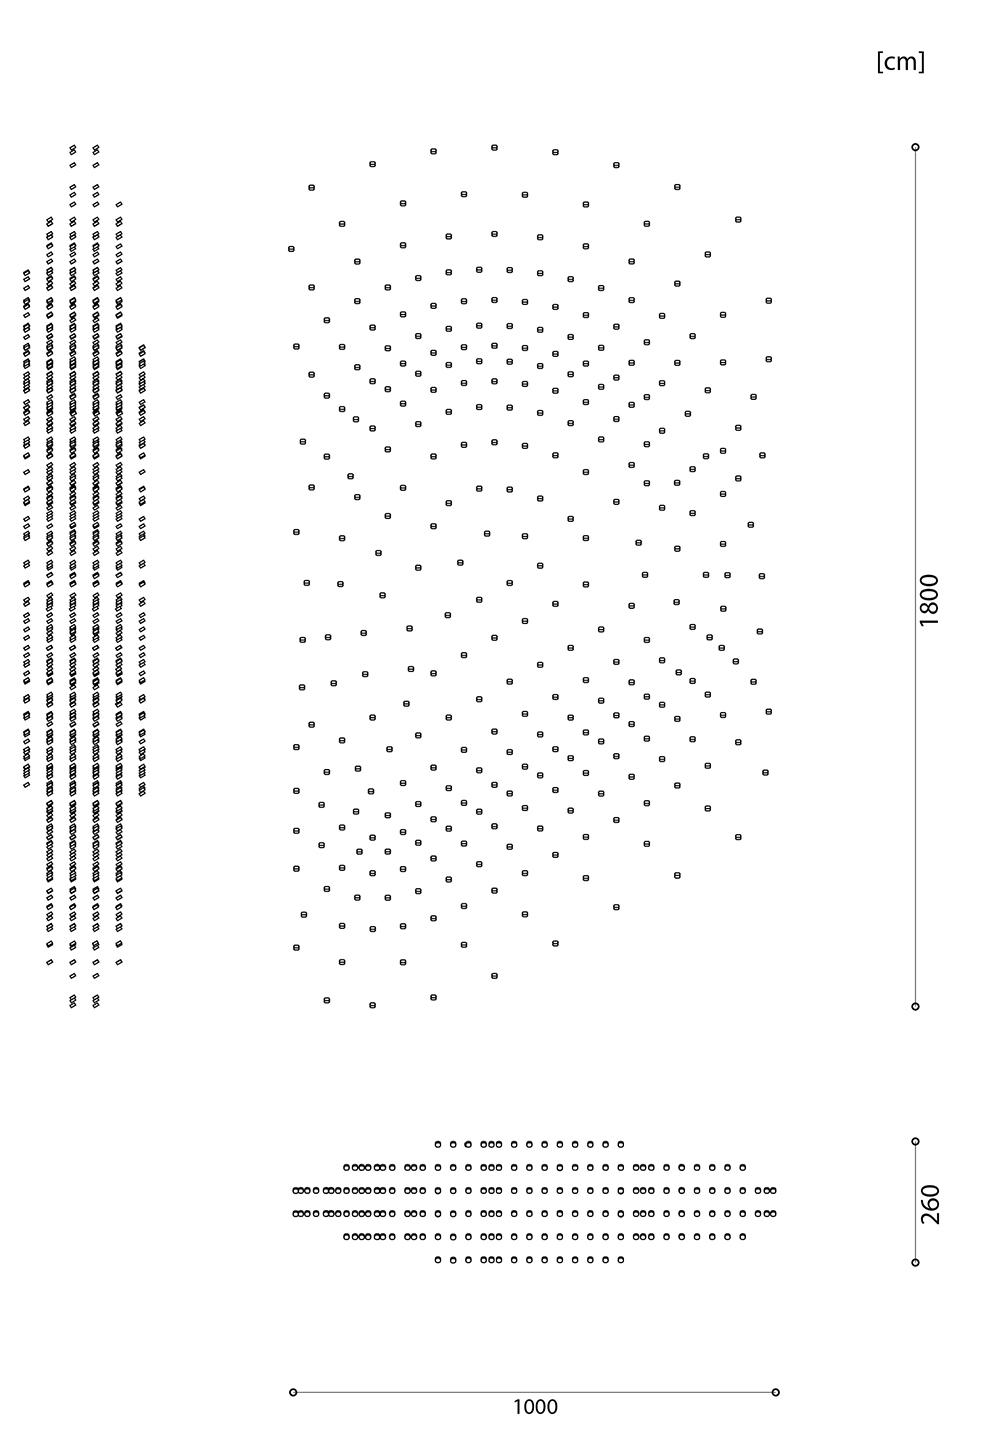 wymiary.jpg